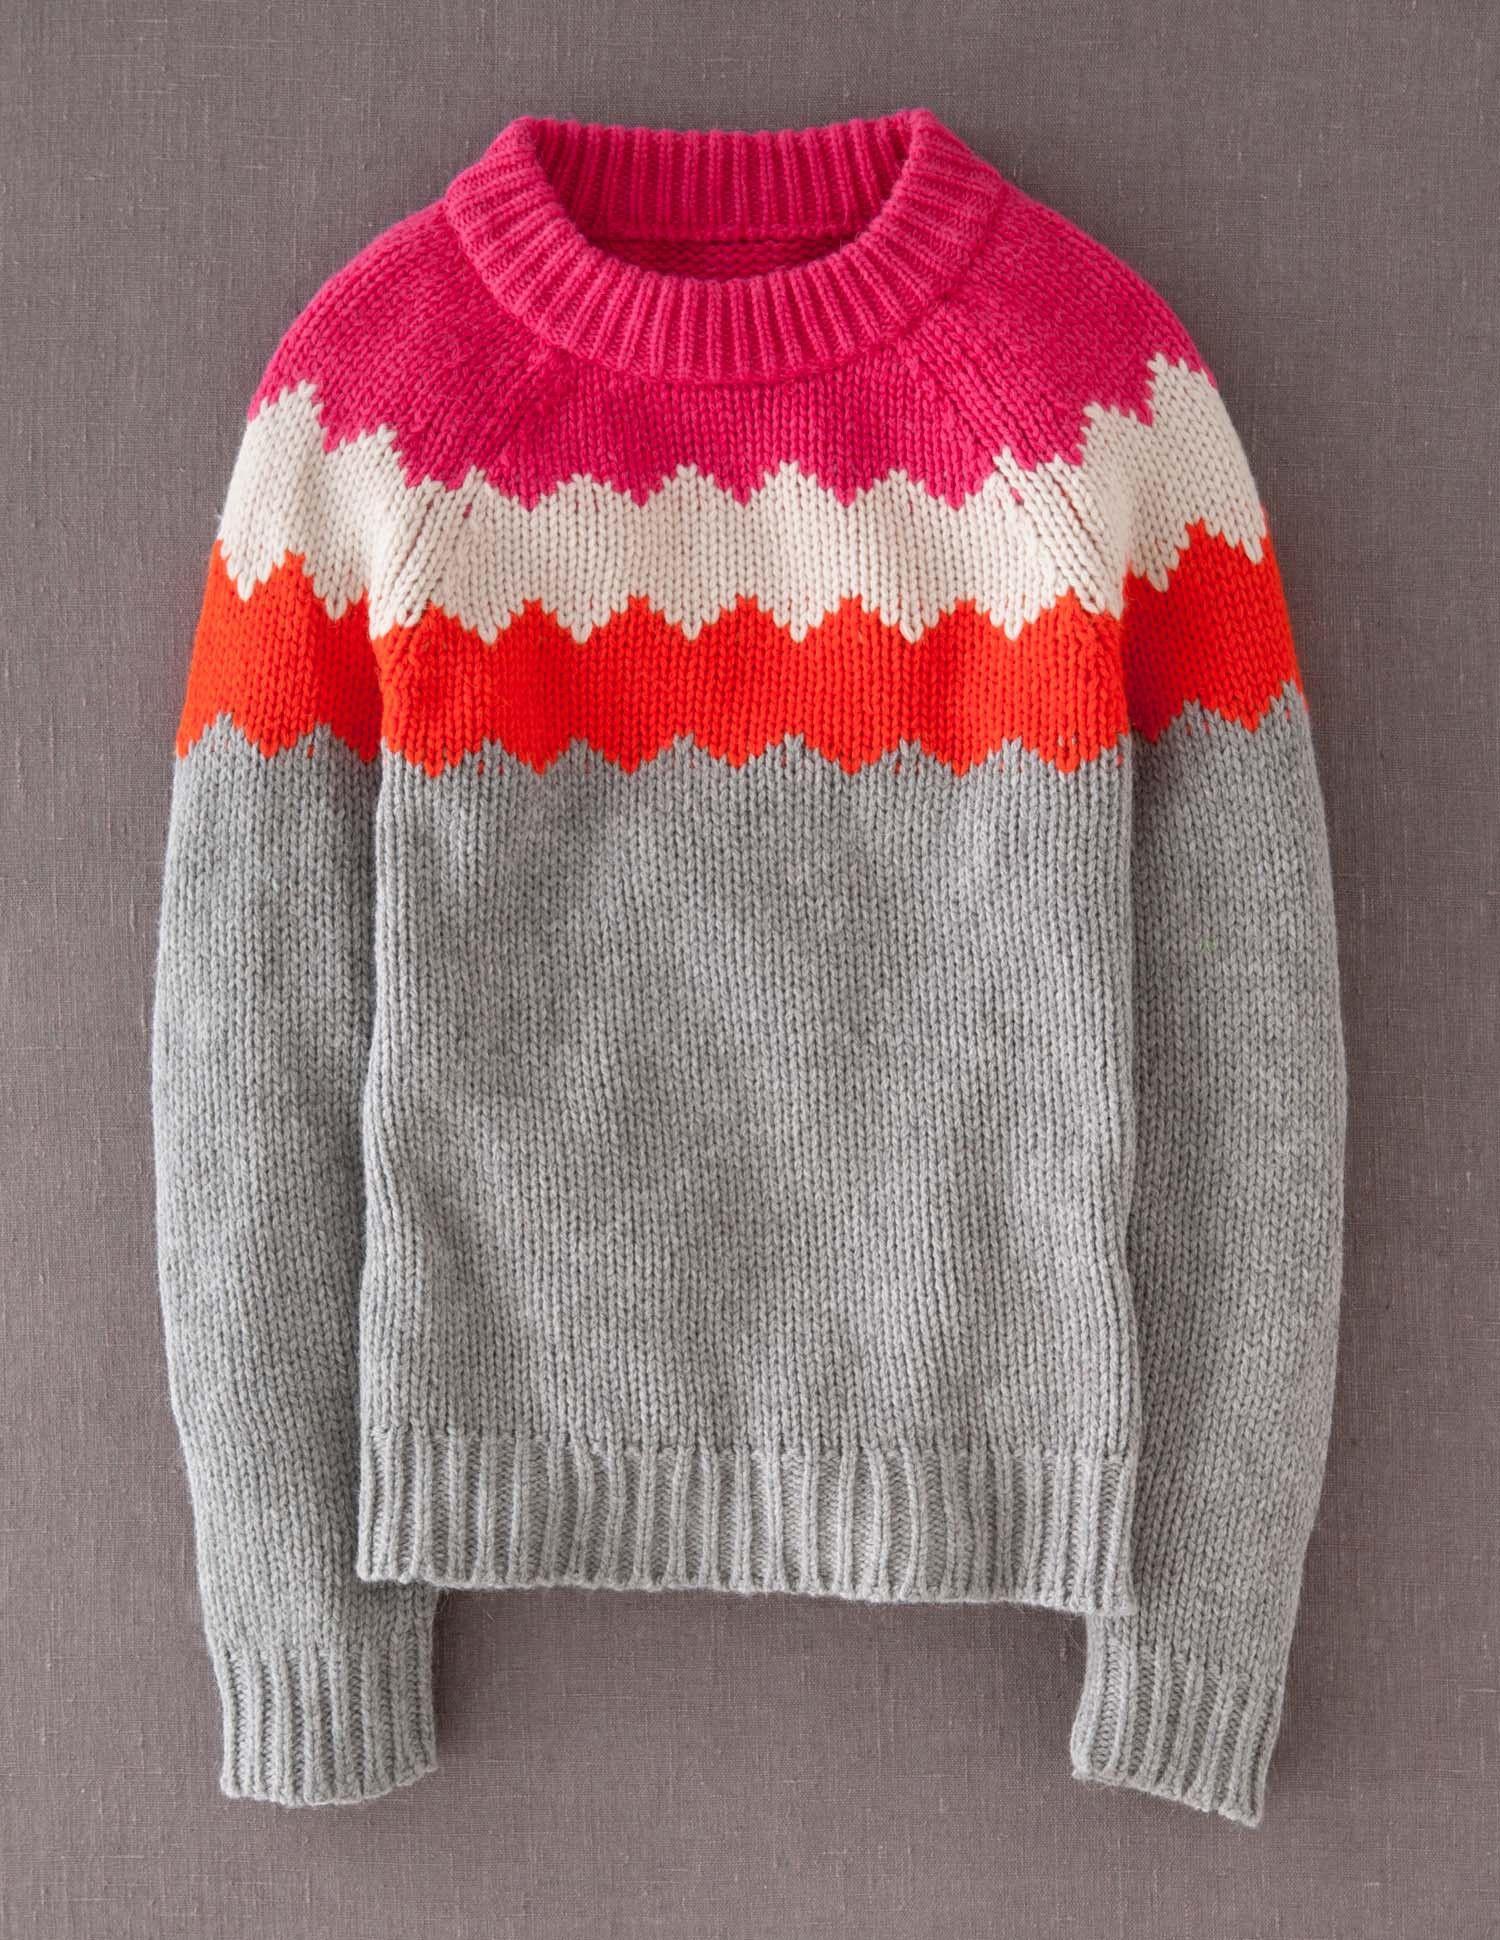 Chevron yoke sweater wk901 sweaters at boden pretty knits chevron yoke sweater from boden must find a look alike knitting pattern bankloansurffo Images